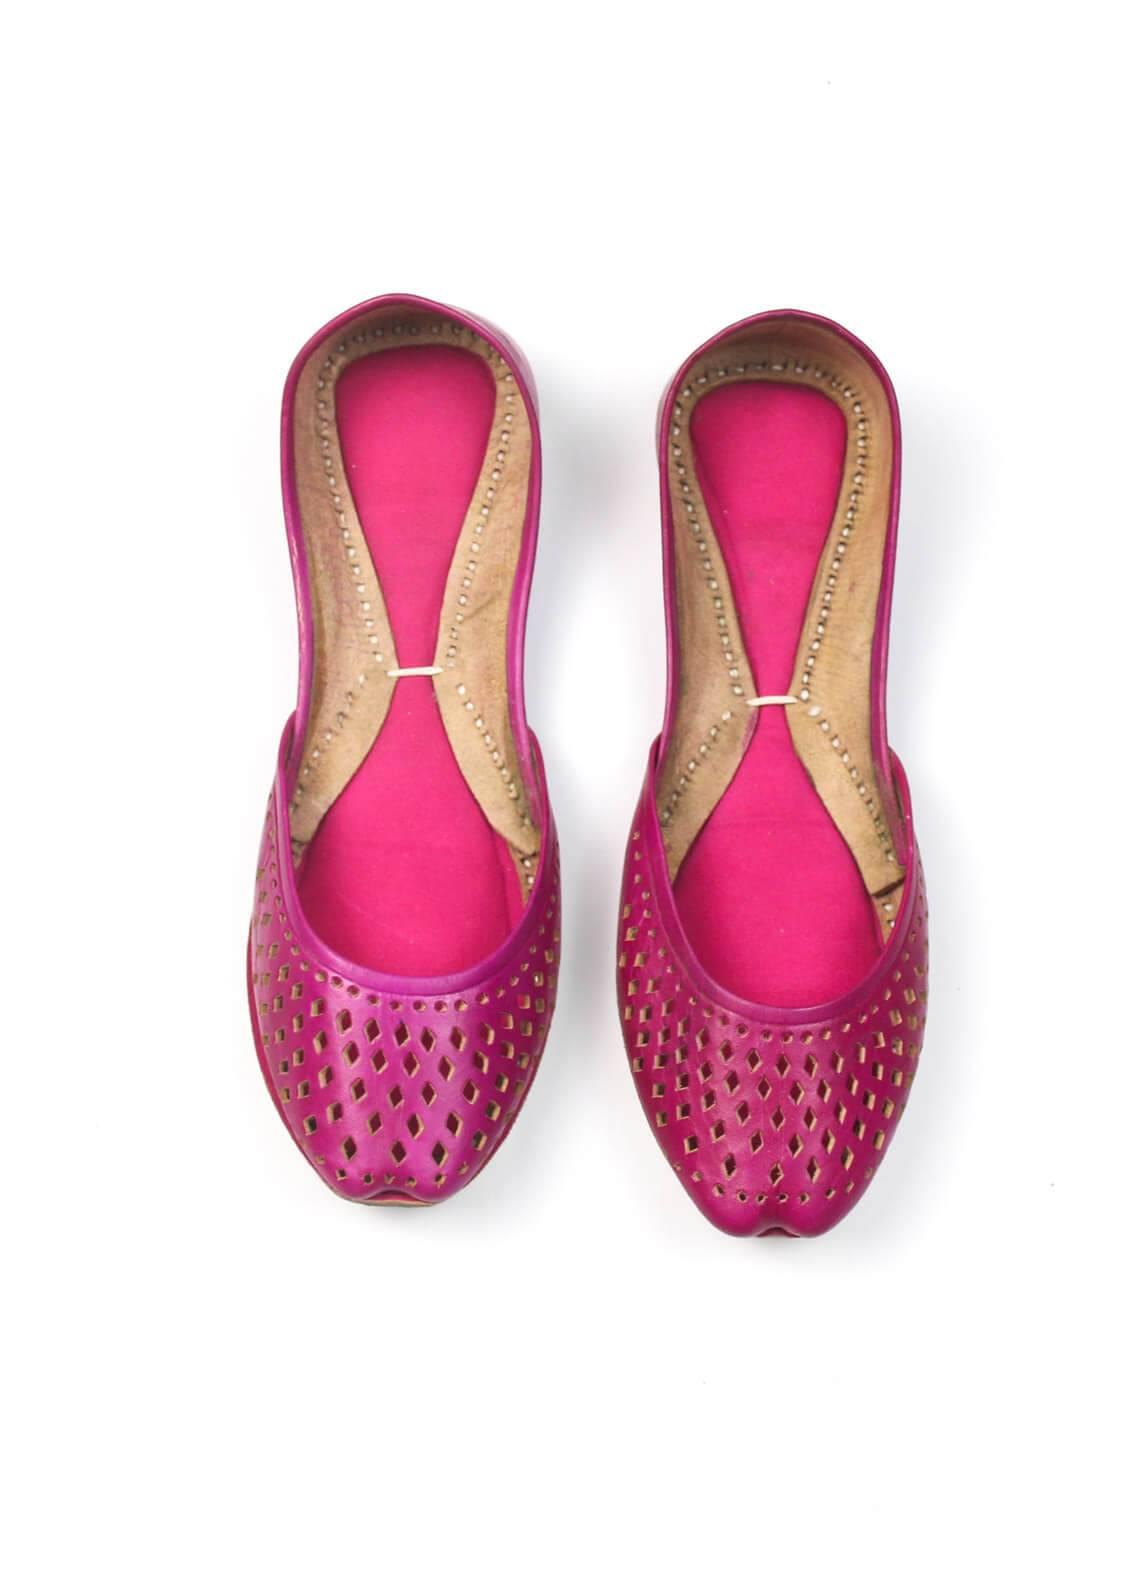 Silk Avenue Cutwork Style Khussa Leather SAF019-Pink